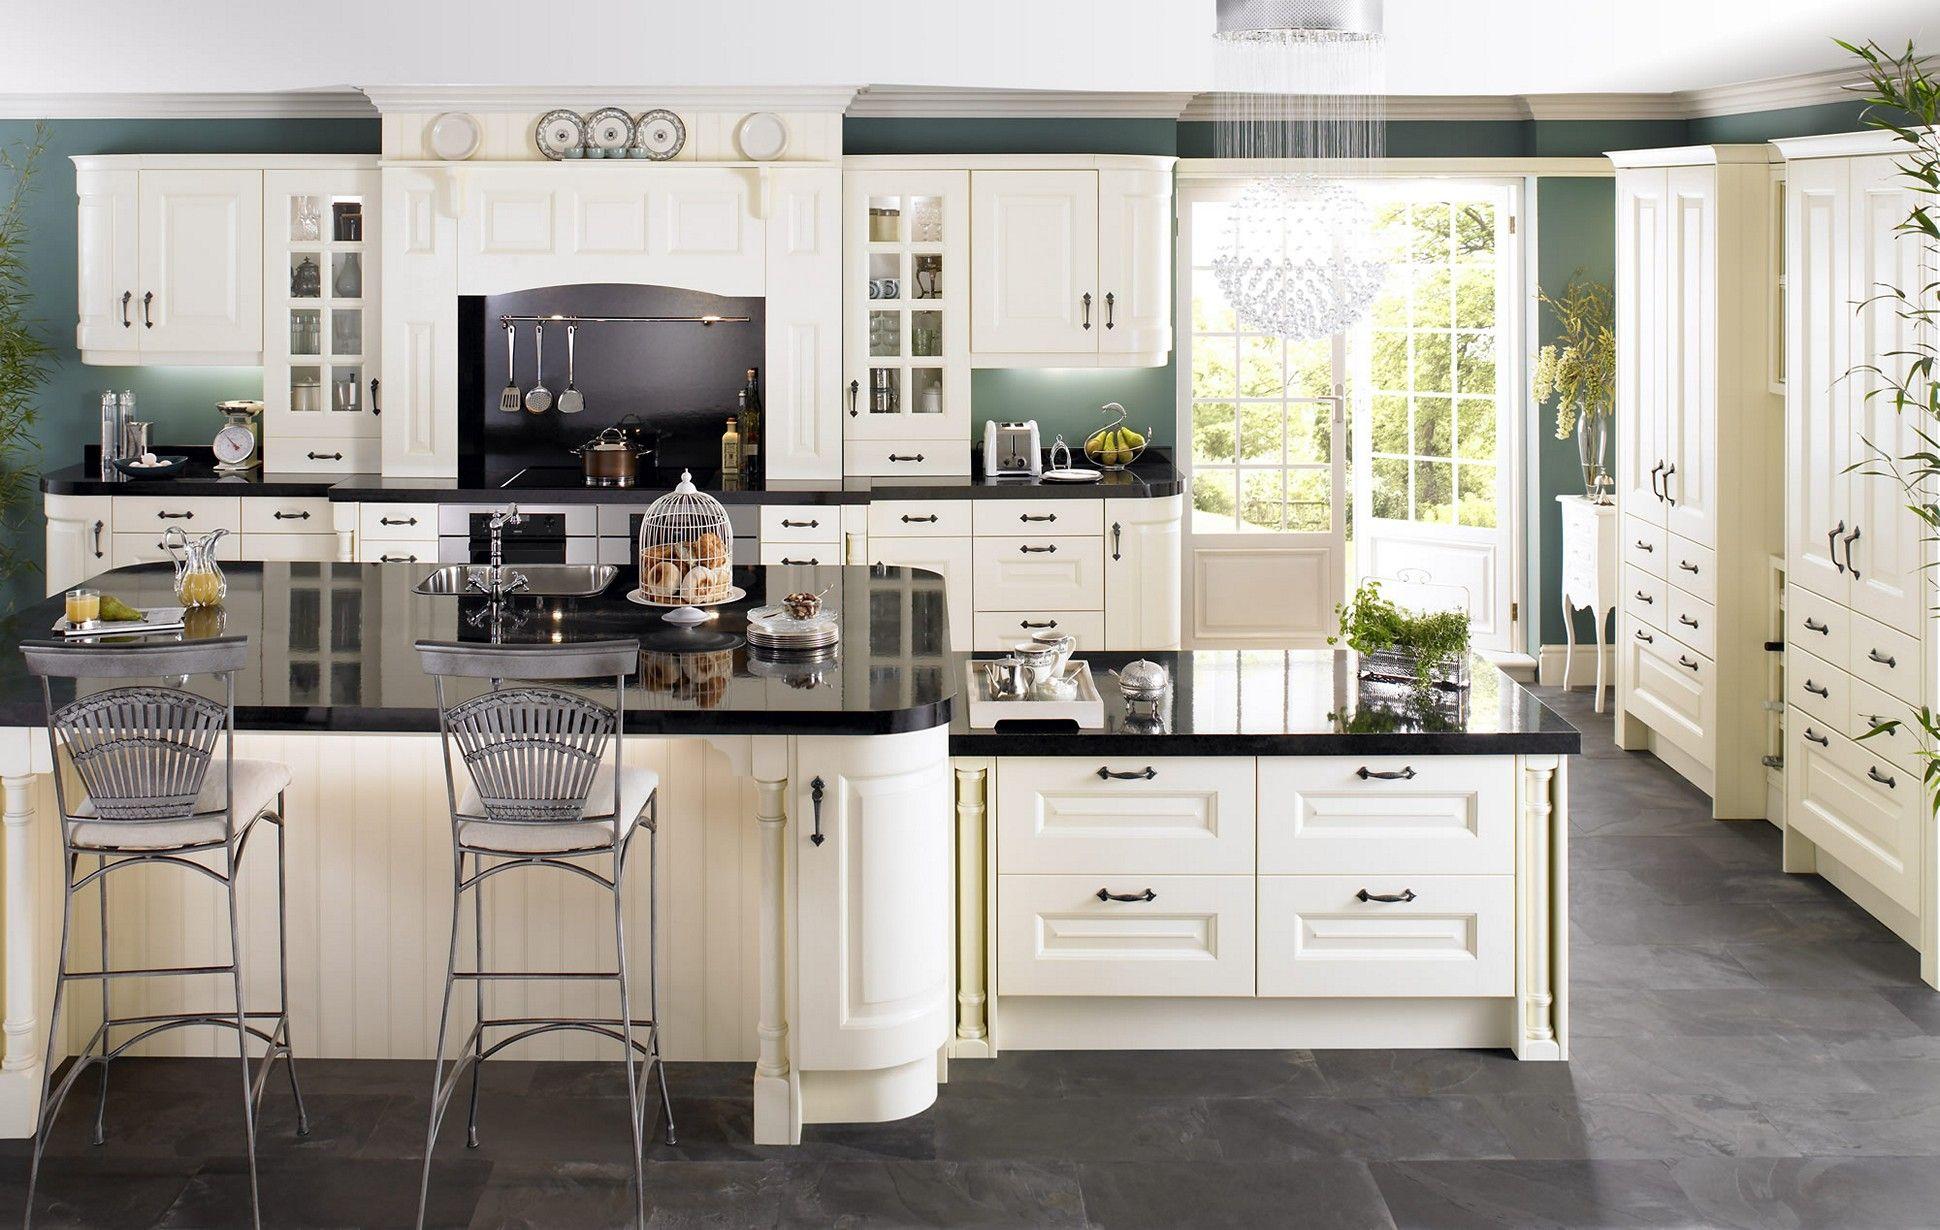 Cream Kitchen Cabinets With Dark Countertops Kitchen Island Cream Kitchen Cabinet Design Country White Kitchen Country Style Kitchen